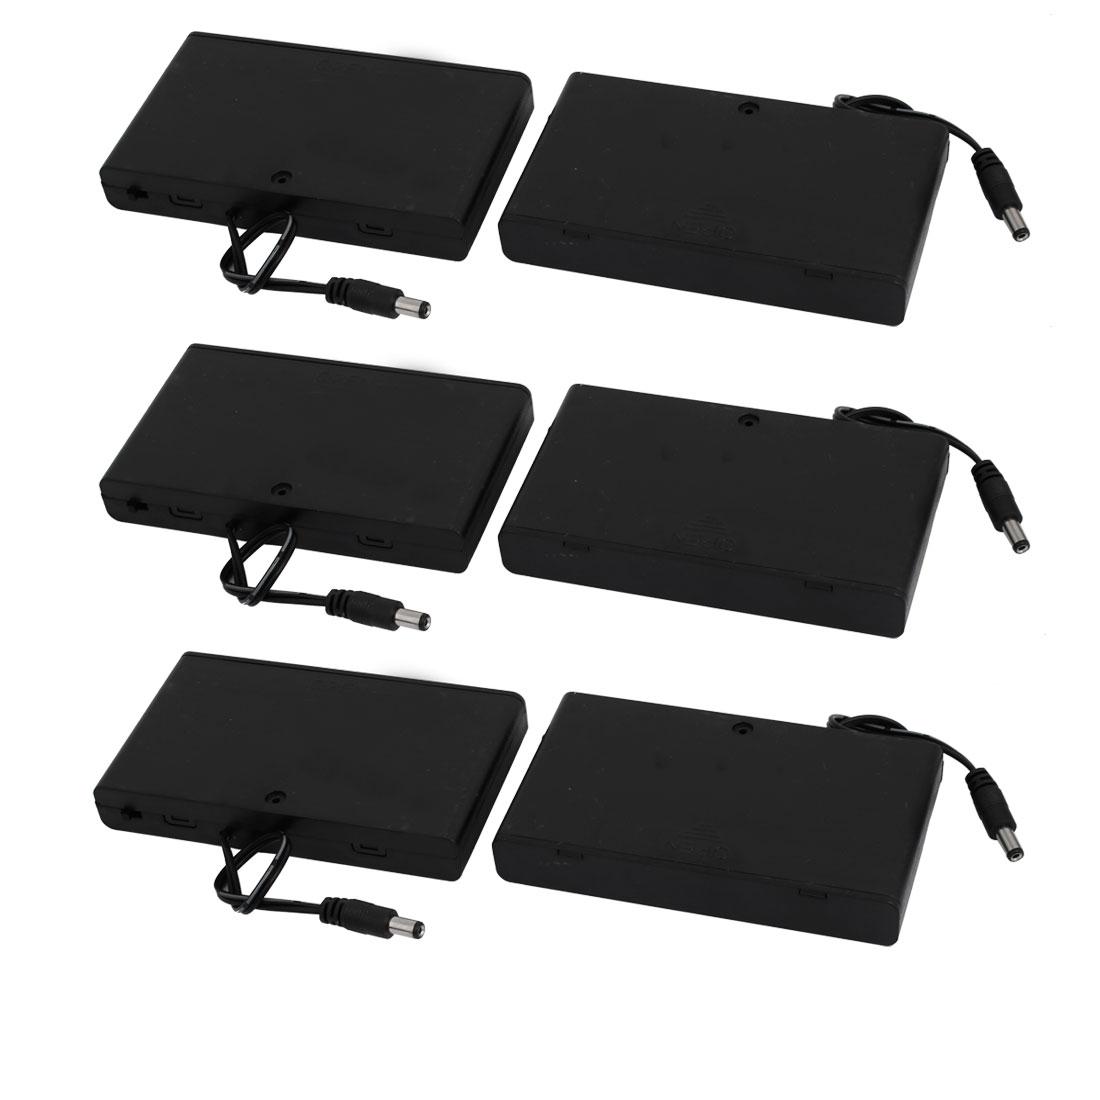 6 Pcs DC Jack Connector Battery Holder Case for 8 x 1.5V AA Battery